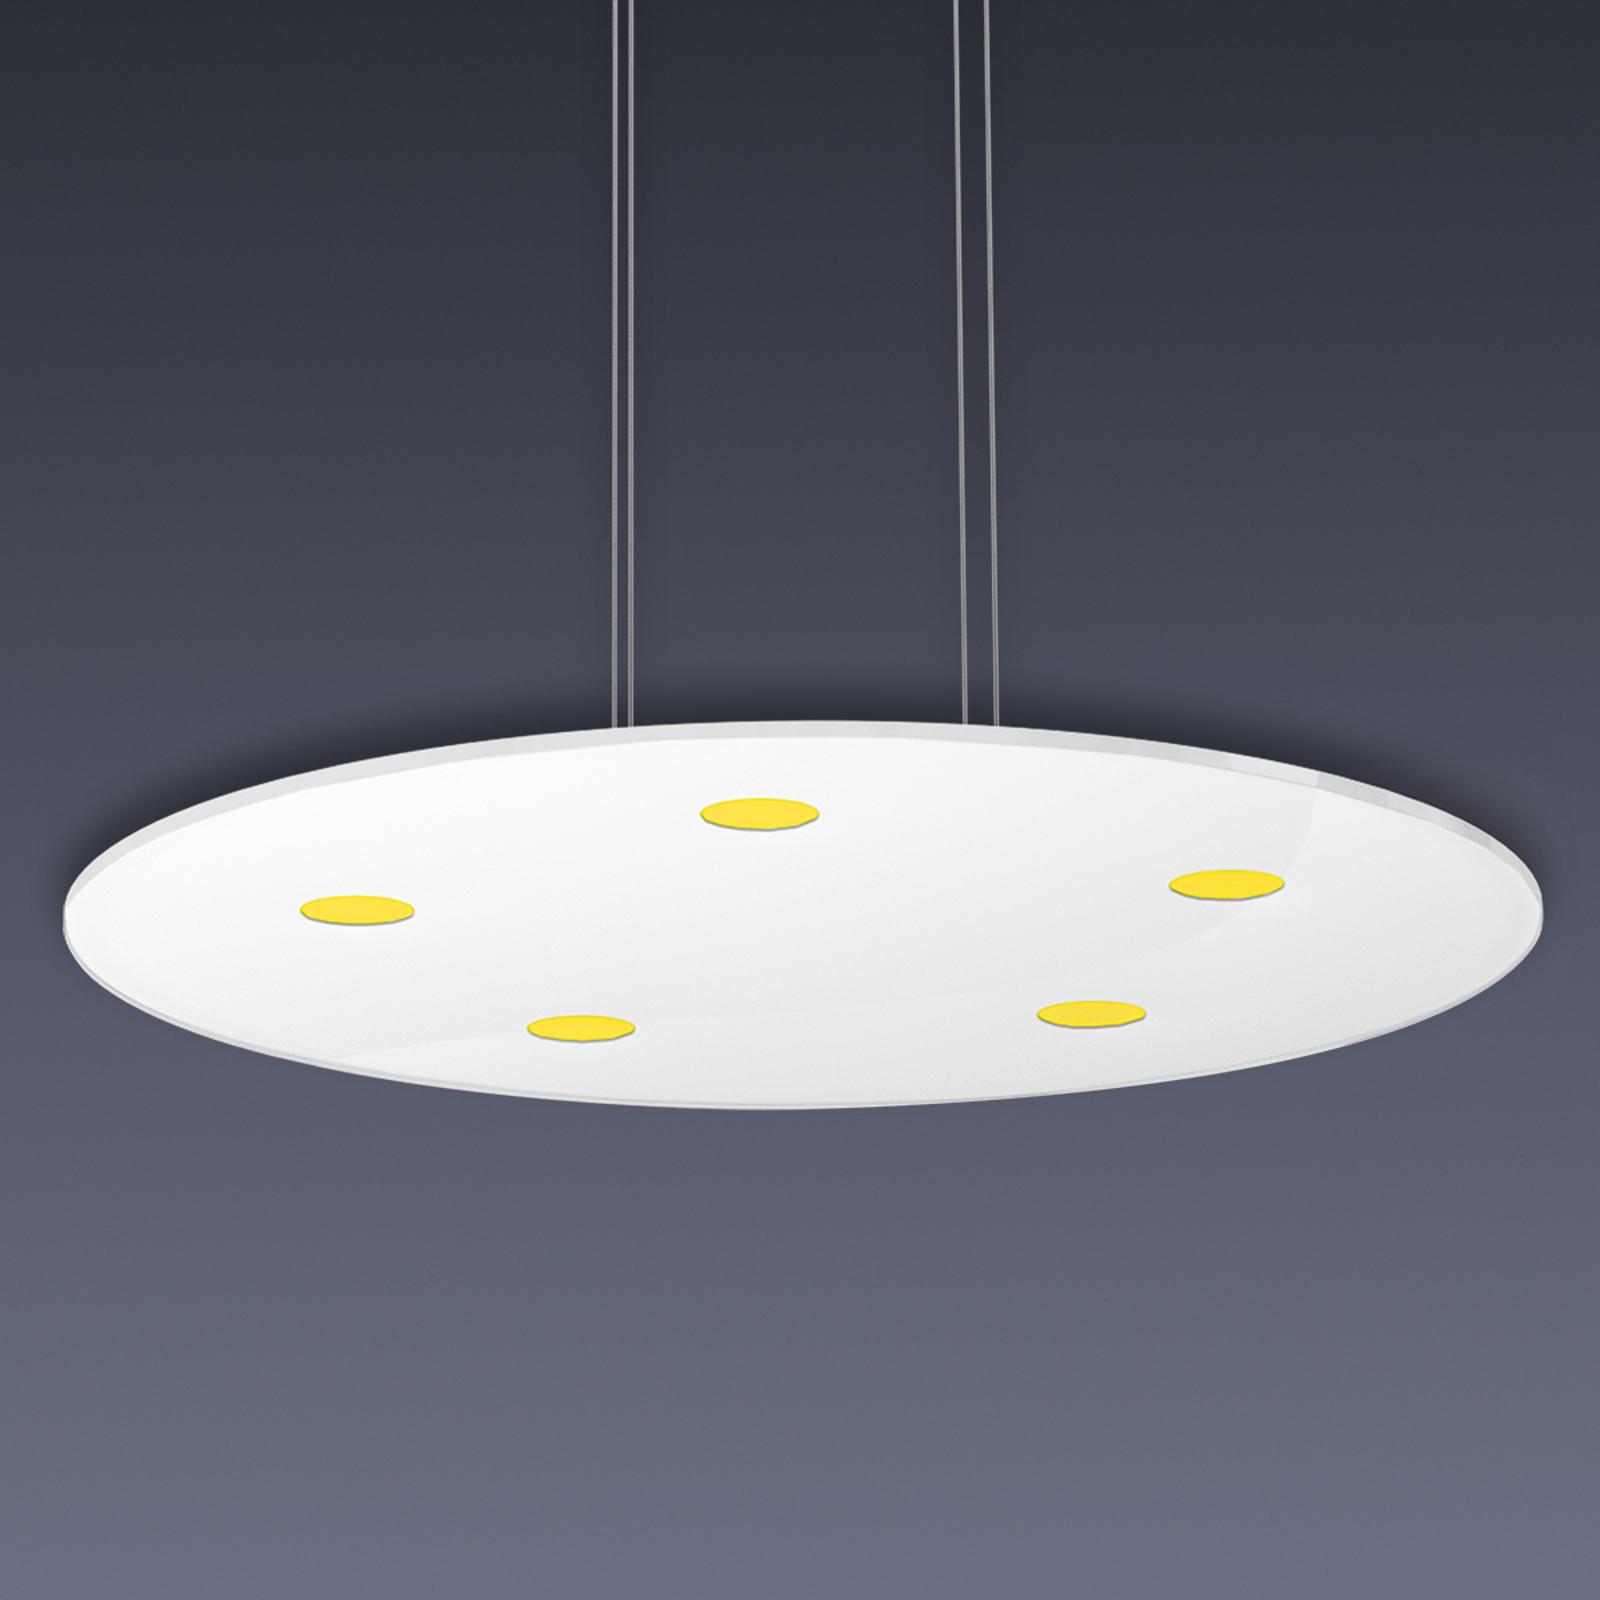 Rund LED-pendellampe Sunia med touch-dæmper